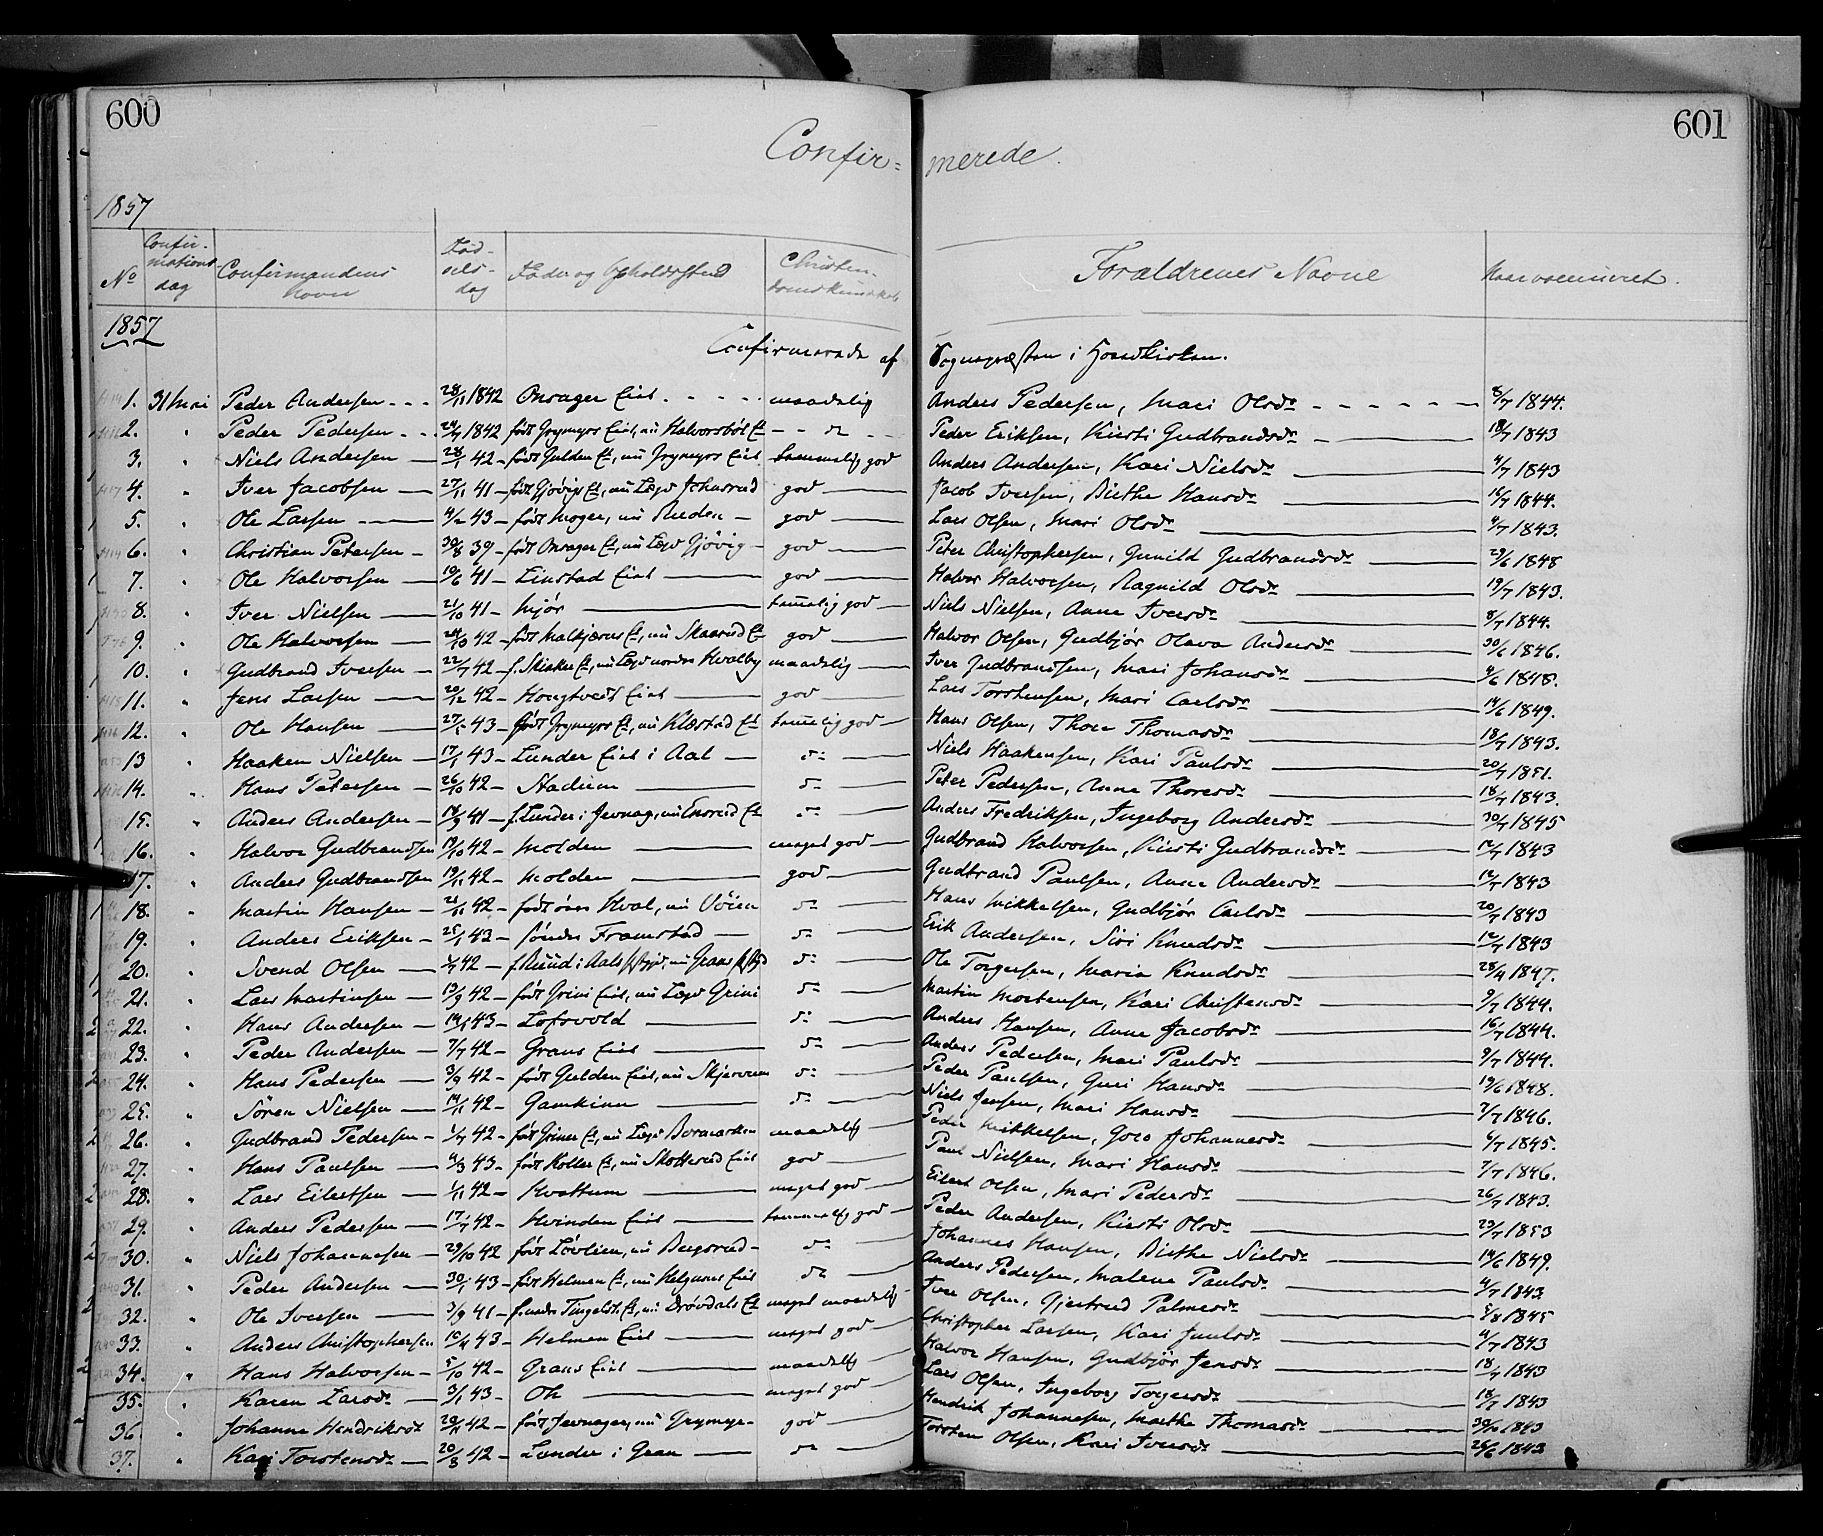 SAH, Gran prestekontor, Ministerialbok nr. 12, 1856-1874, s. 600-601